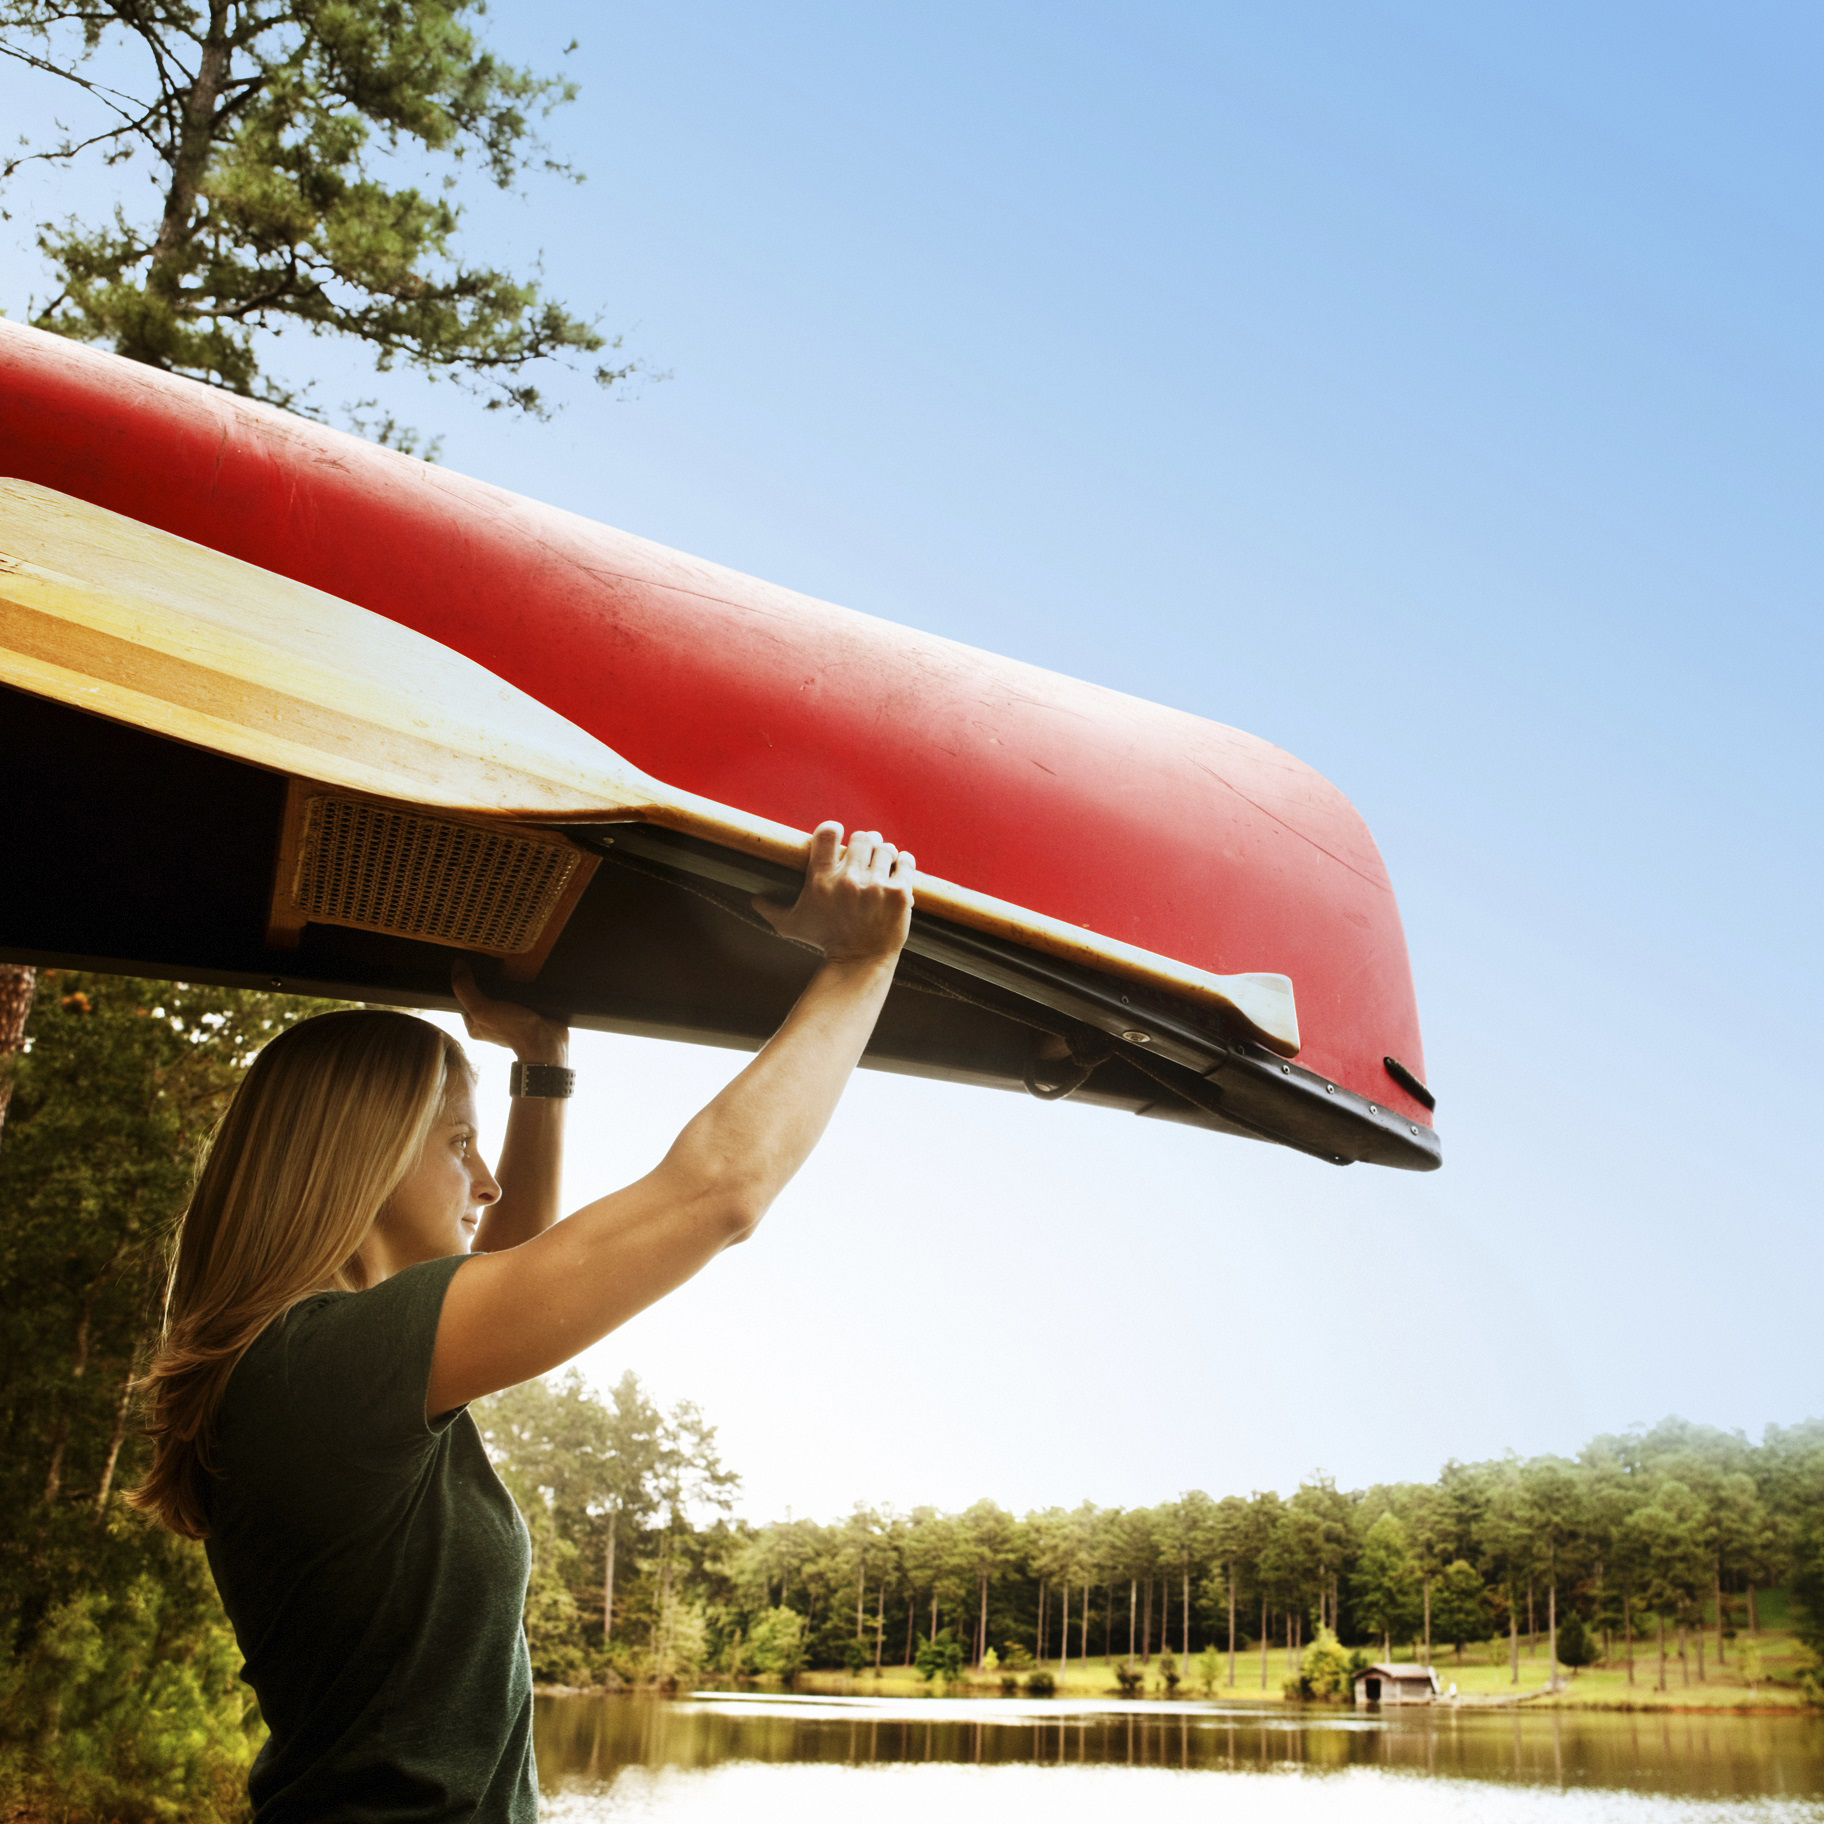 canoe_iStock_000011915180.jpg